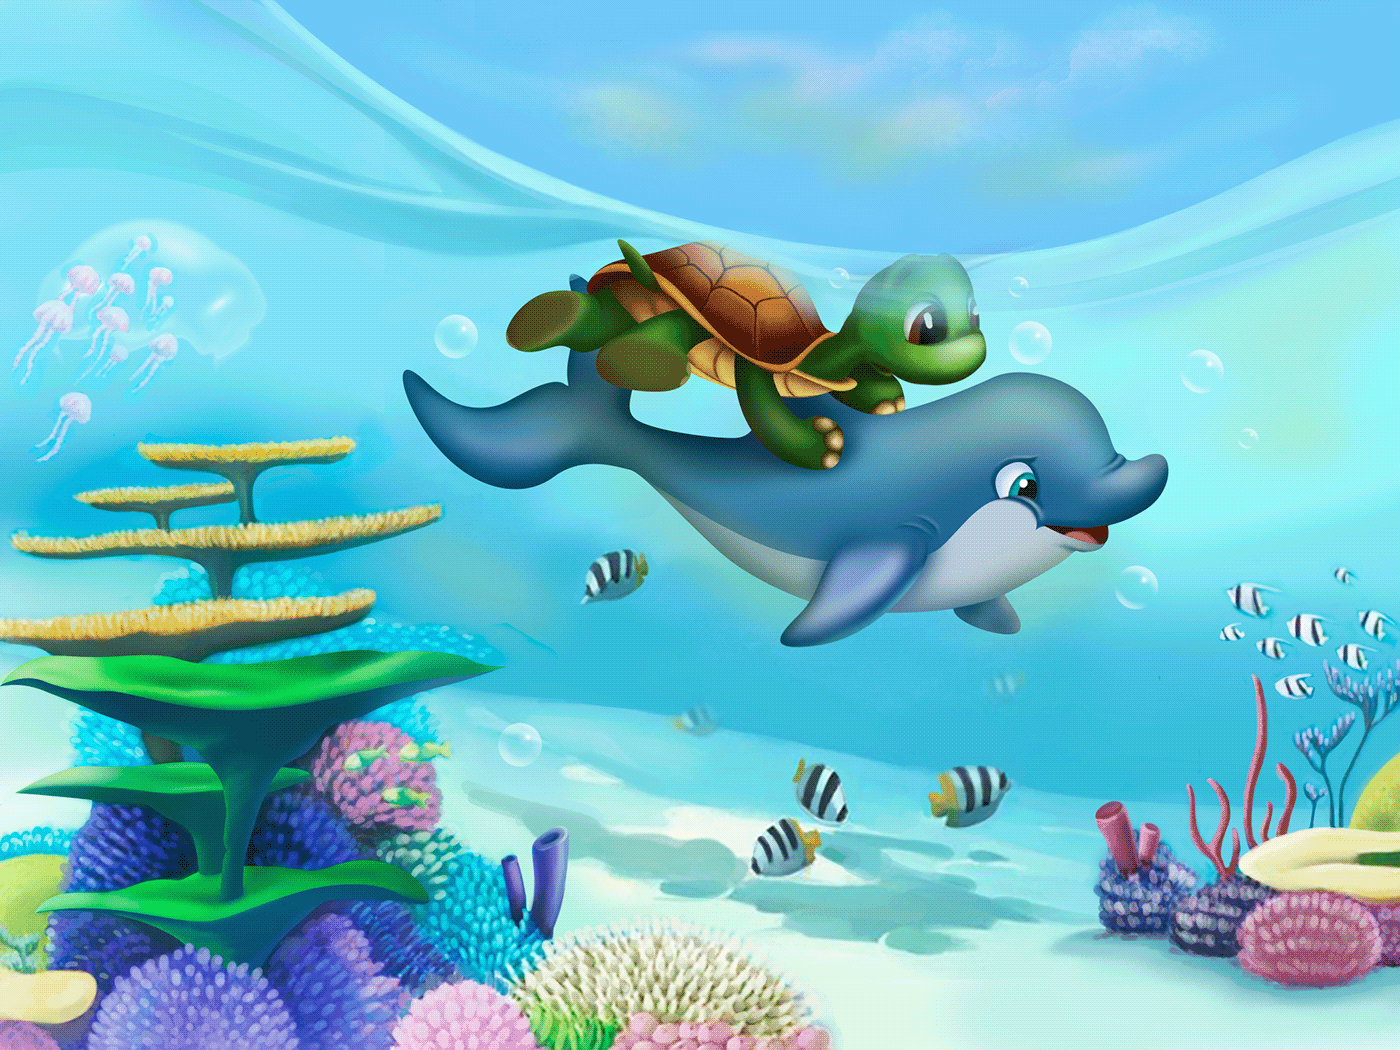 Image may contain: reef, aquarium and cartoon